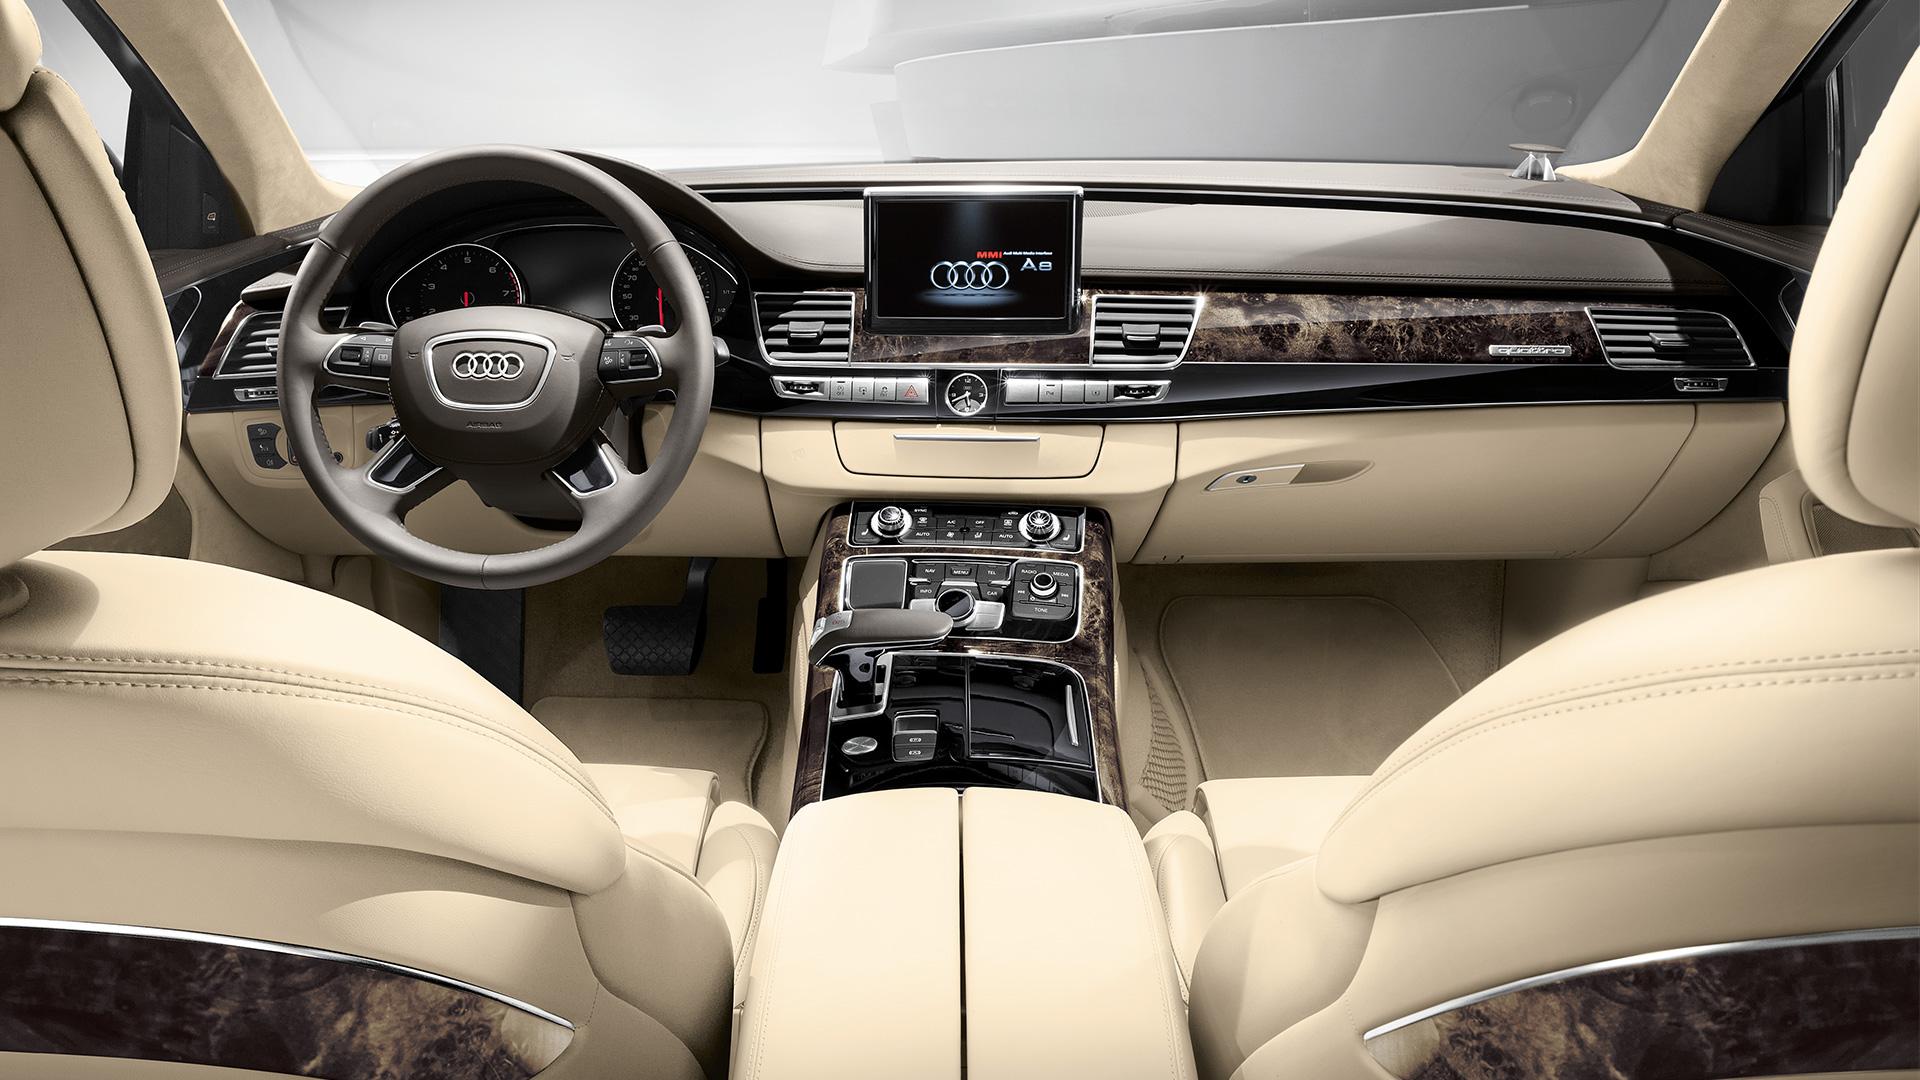 Audi a8 d4 2013 2014 2015 2016 autoevolution for Interieur verlichting